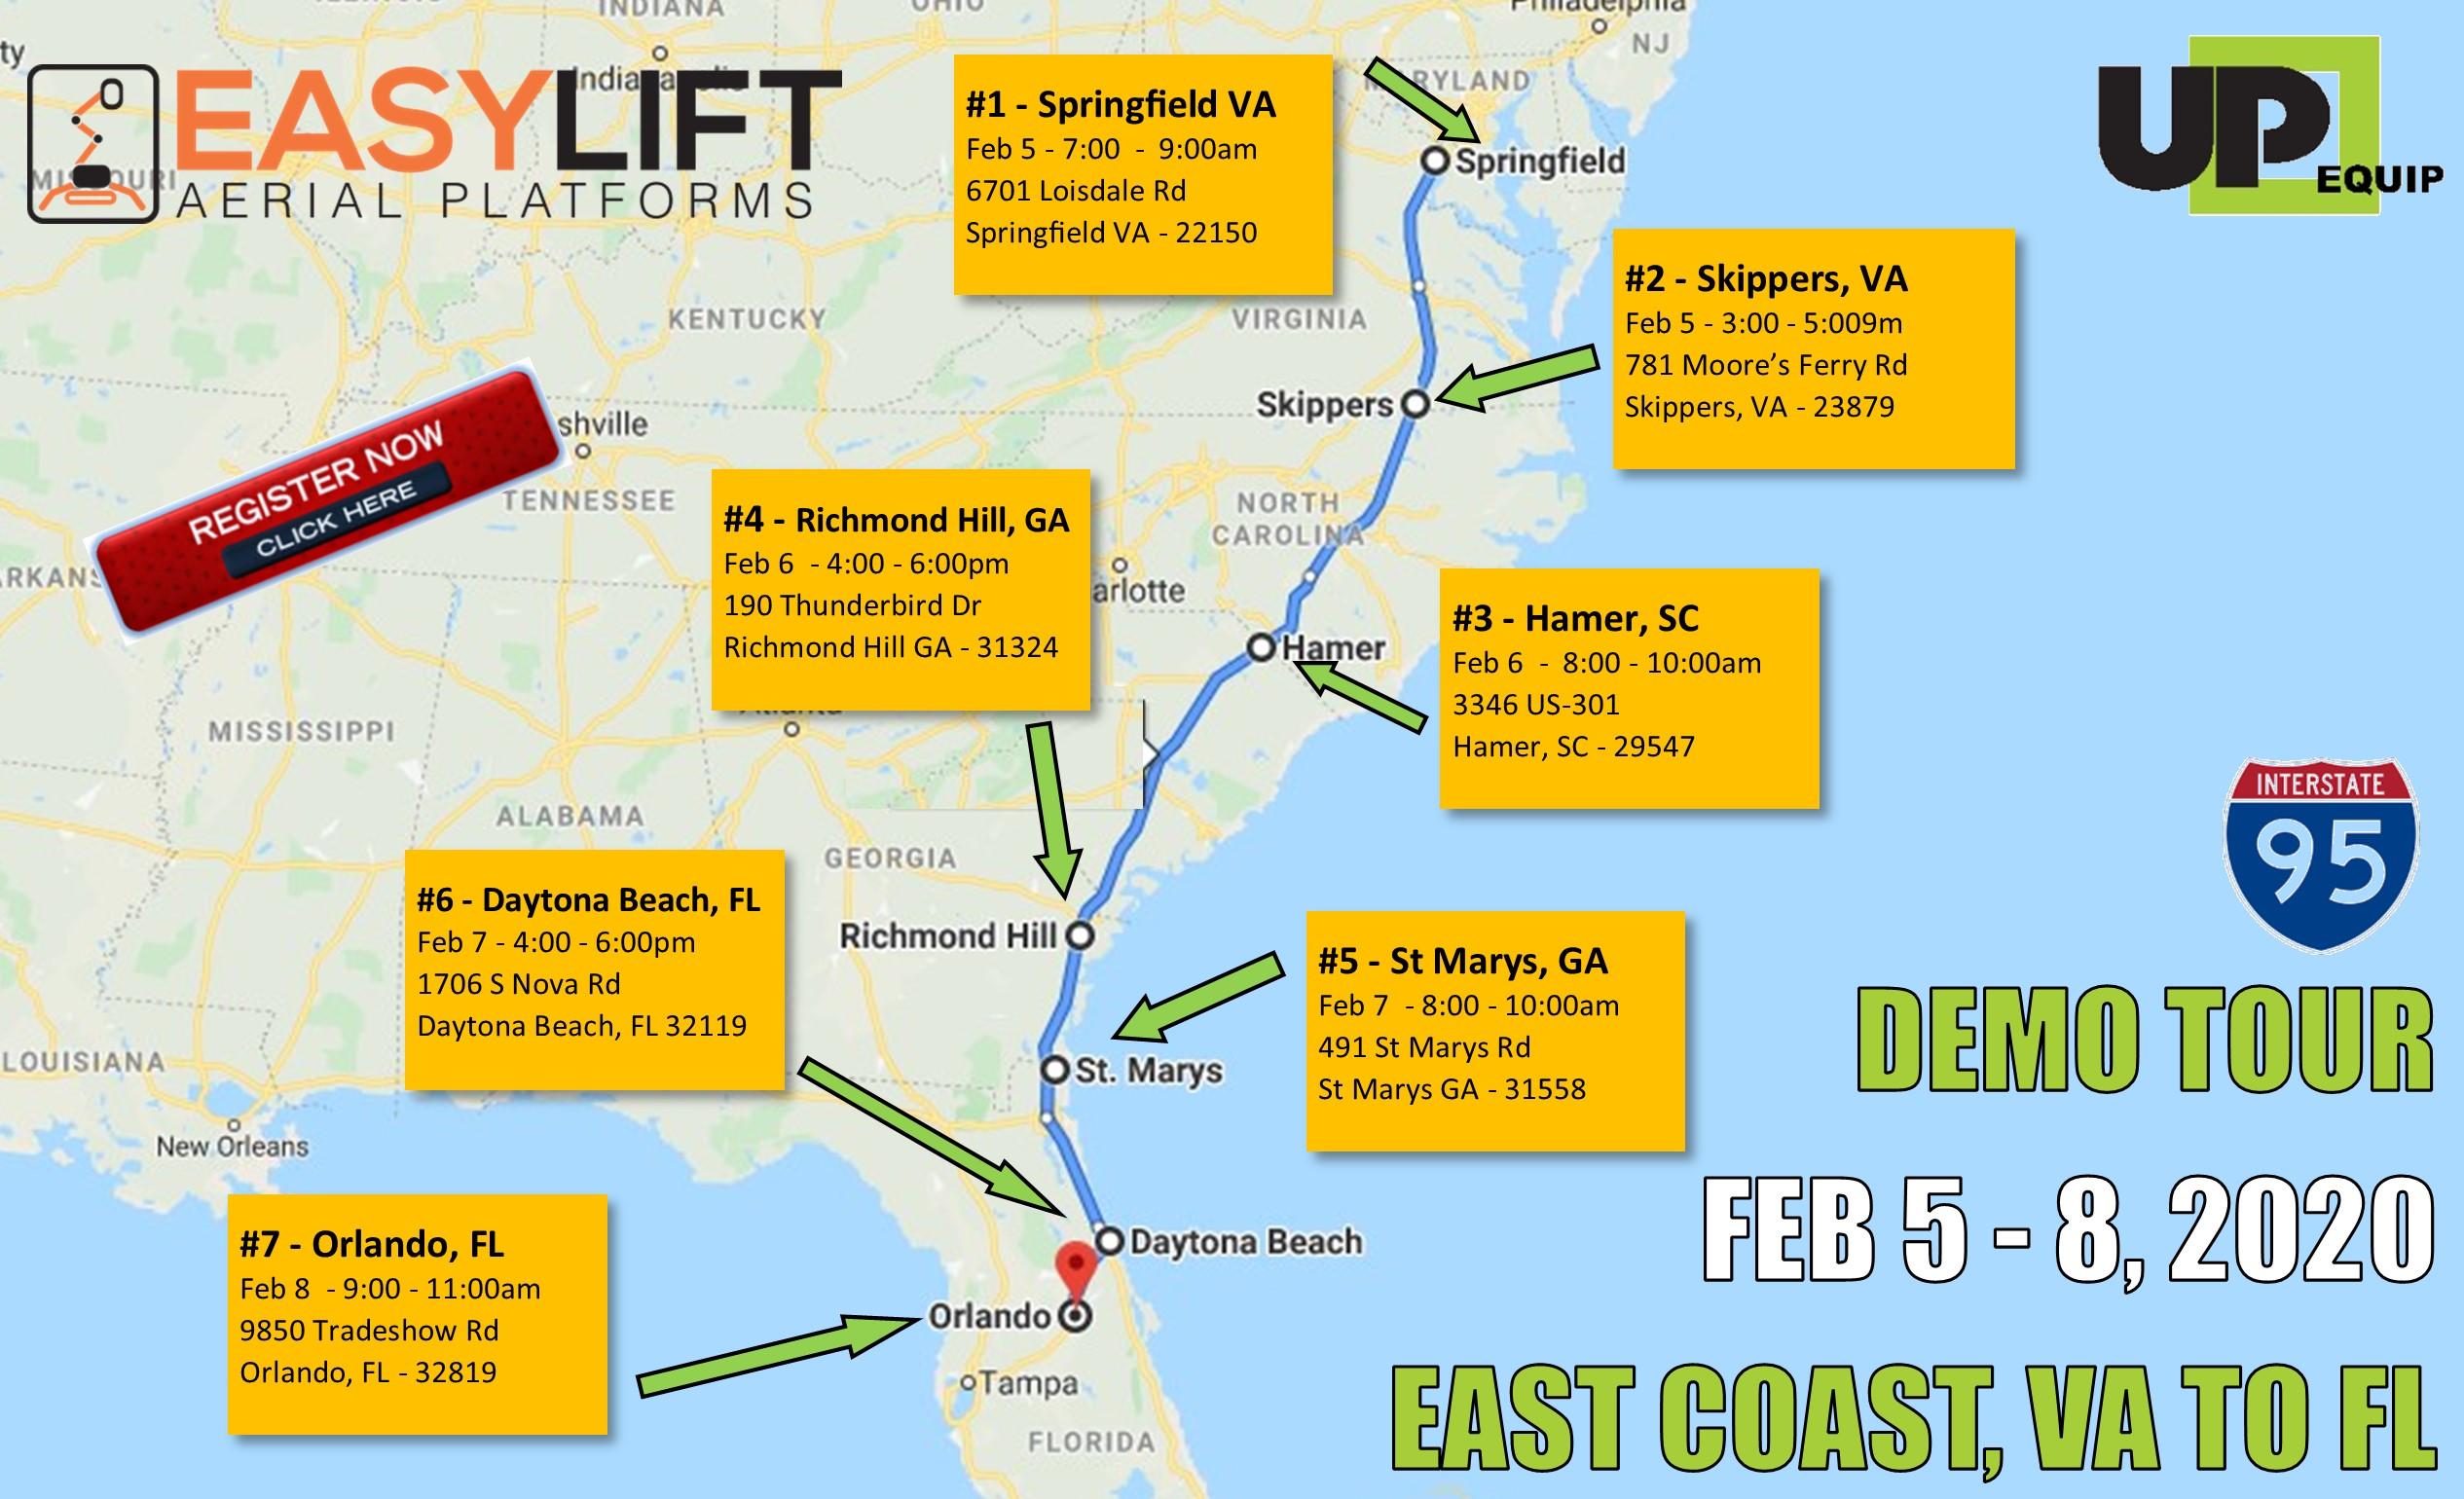 Demo Tour from Virginia to Florida